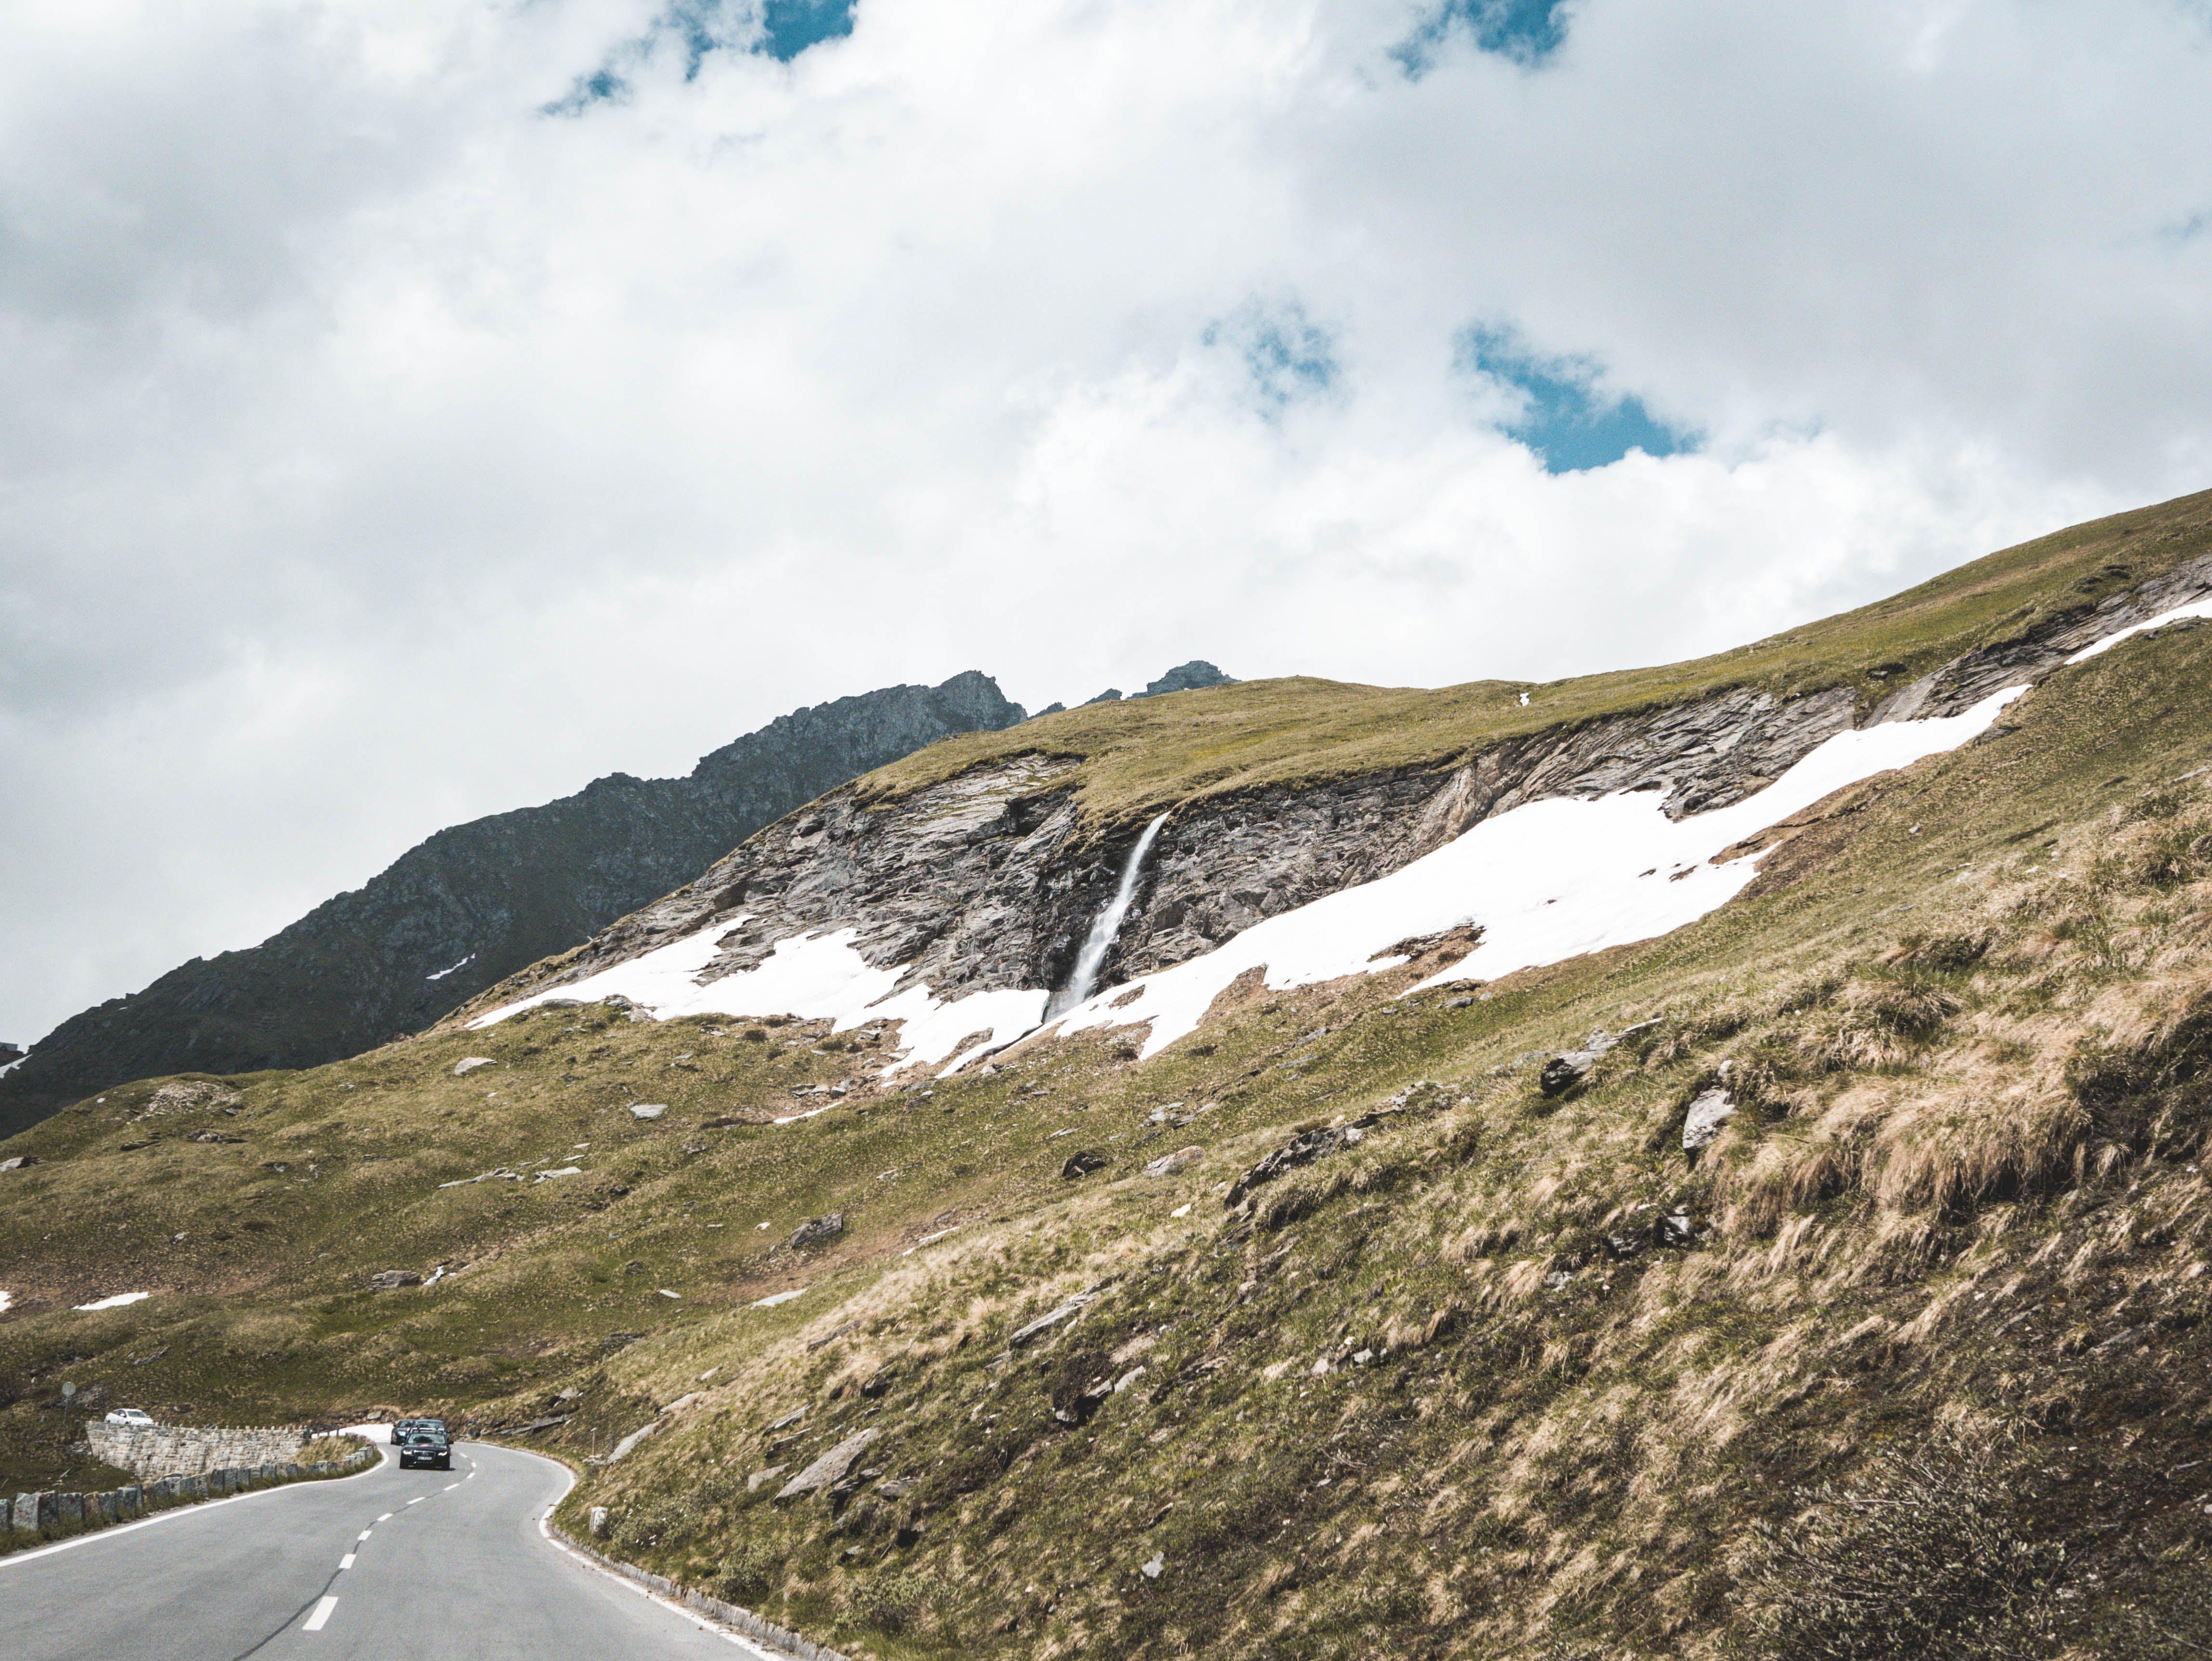 abenteuer, alpin, asphalt